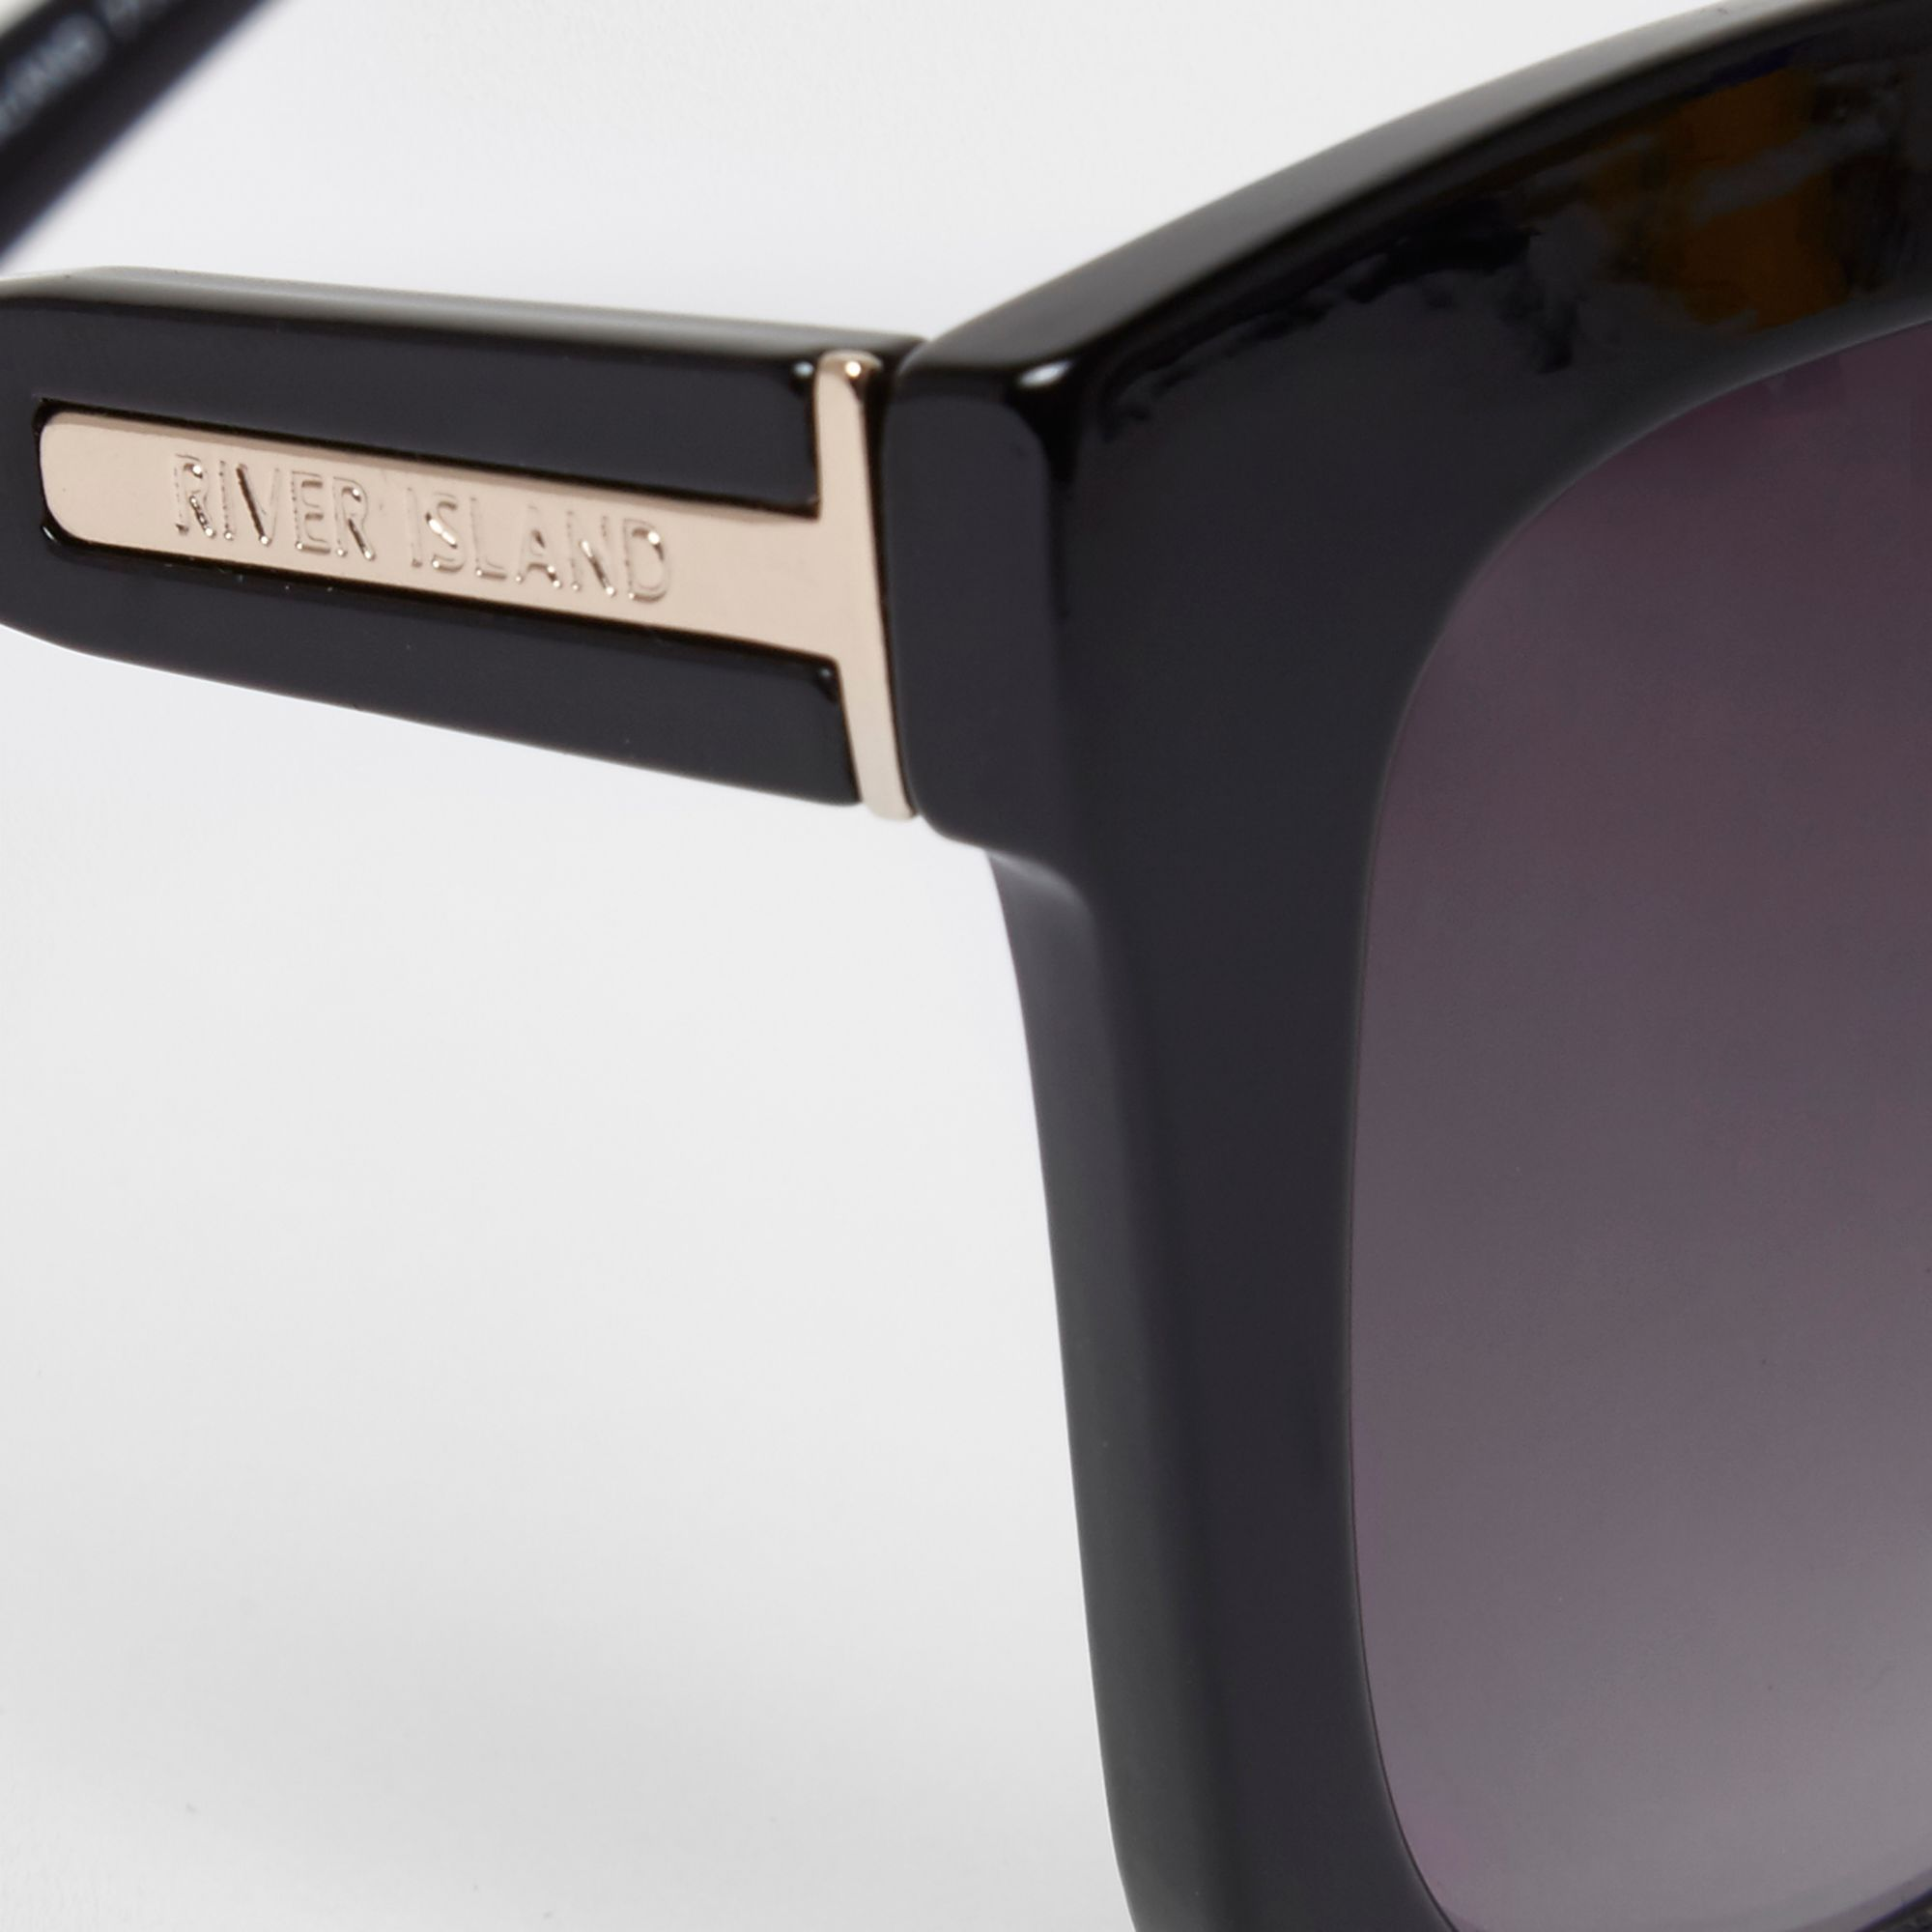 River Island Black oversized glam smoke lens sunglasses at £14 ... de57159f62